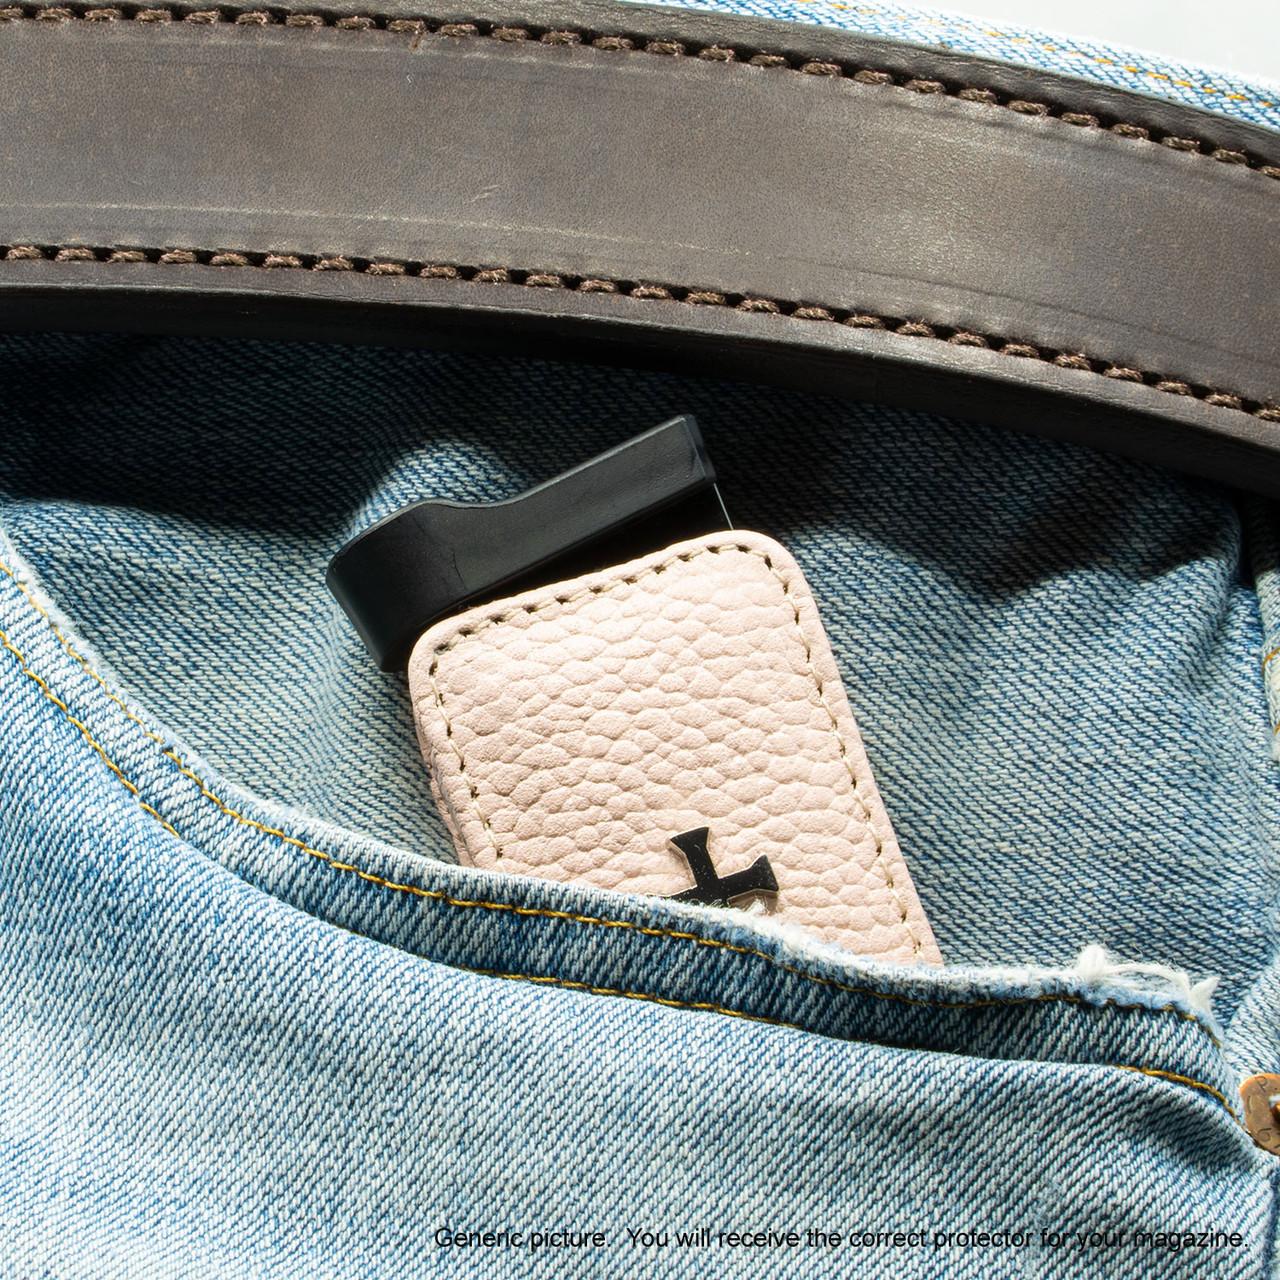 AMT Backup .380 Pink Carry Faithfully Cross Magazine Pocket Protector